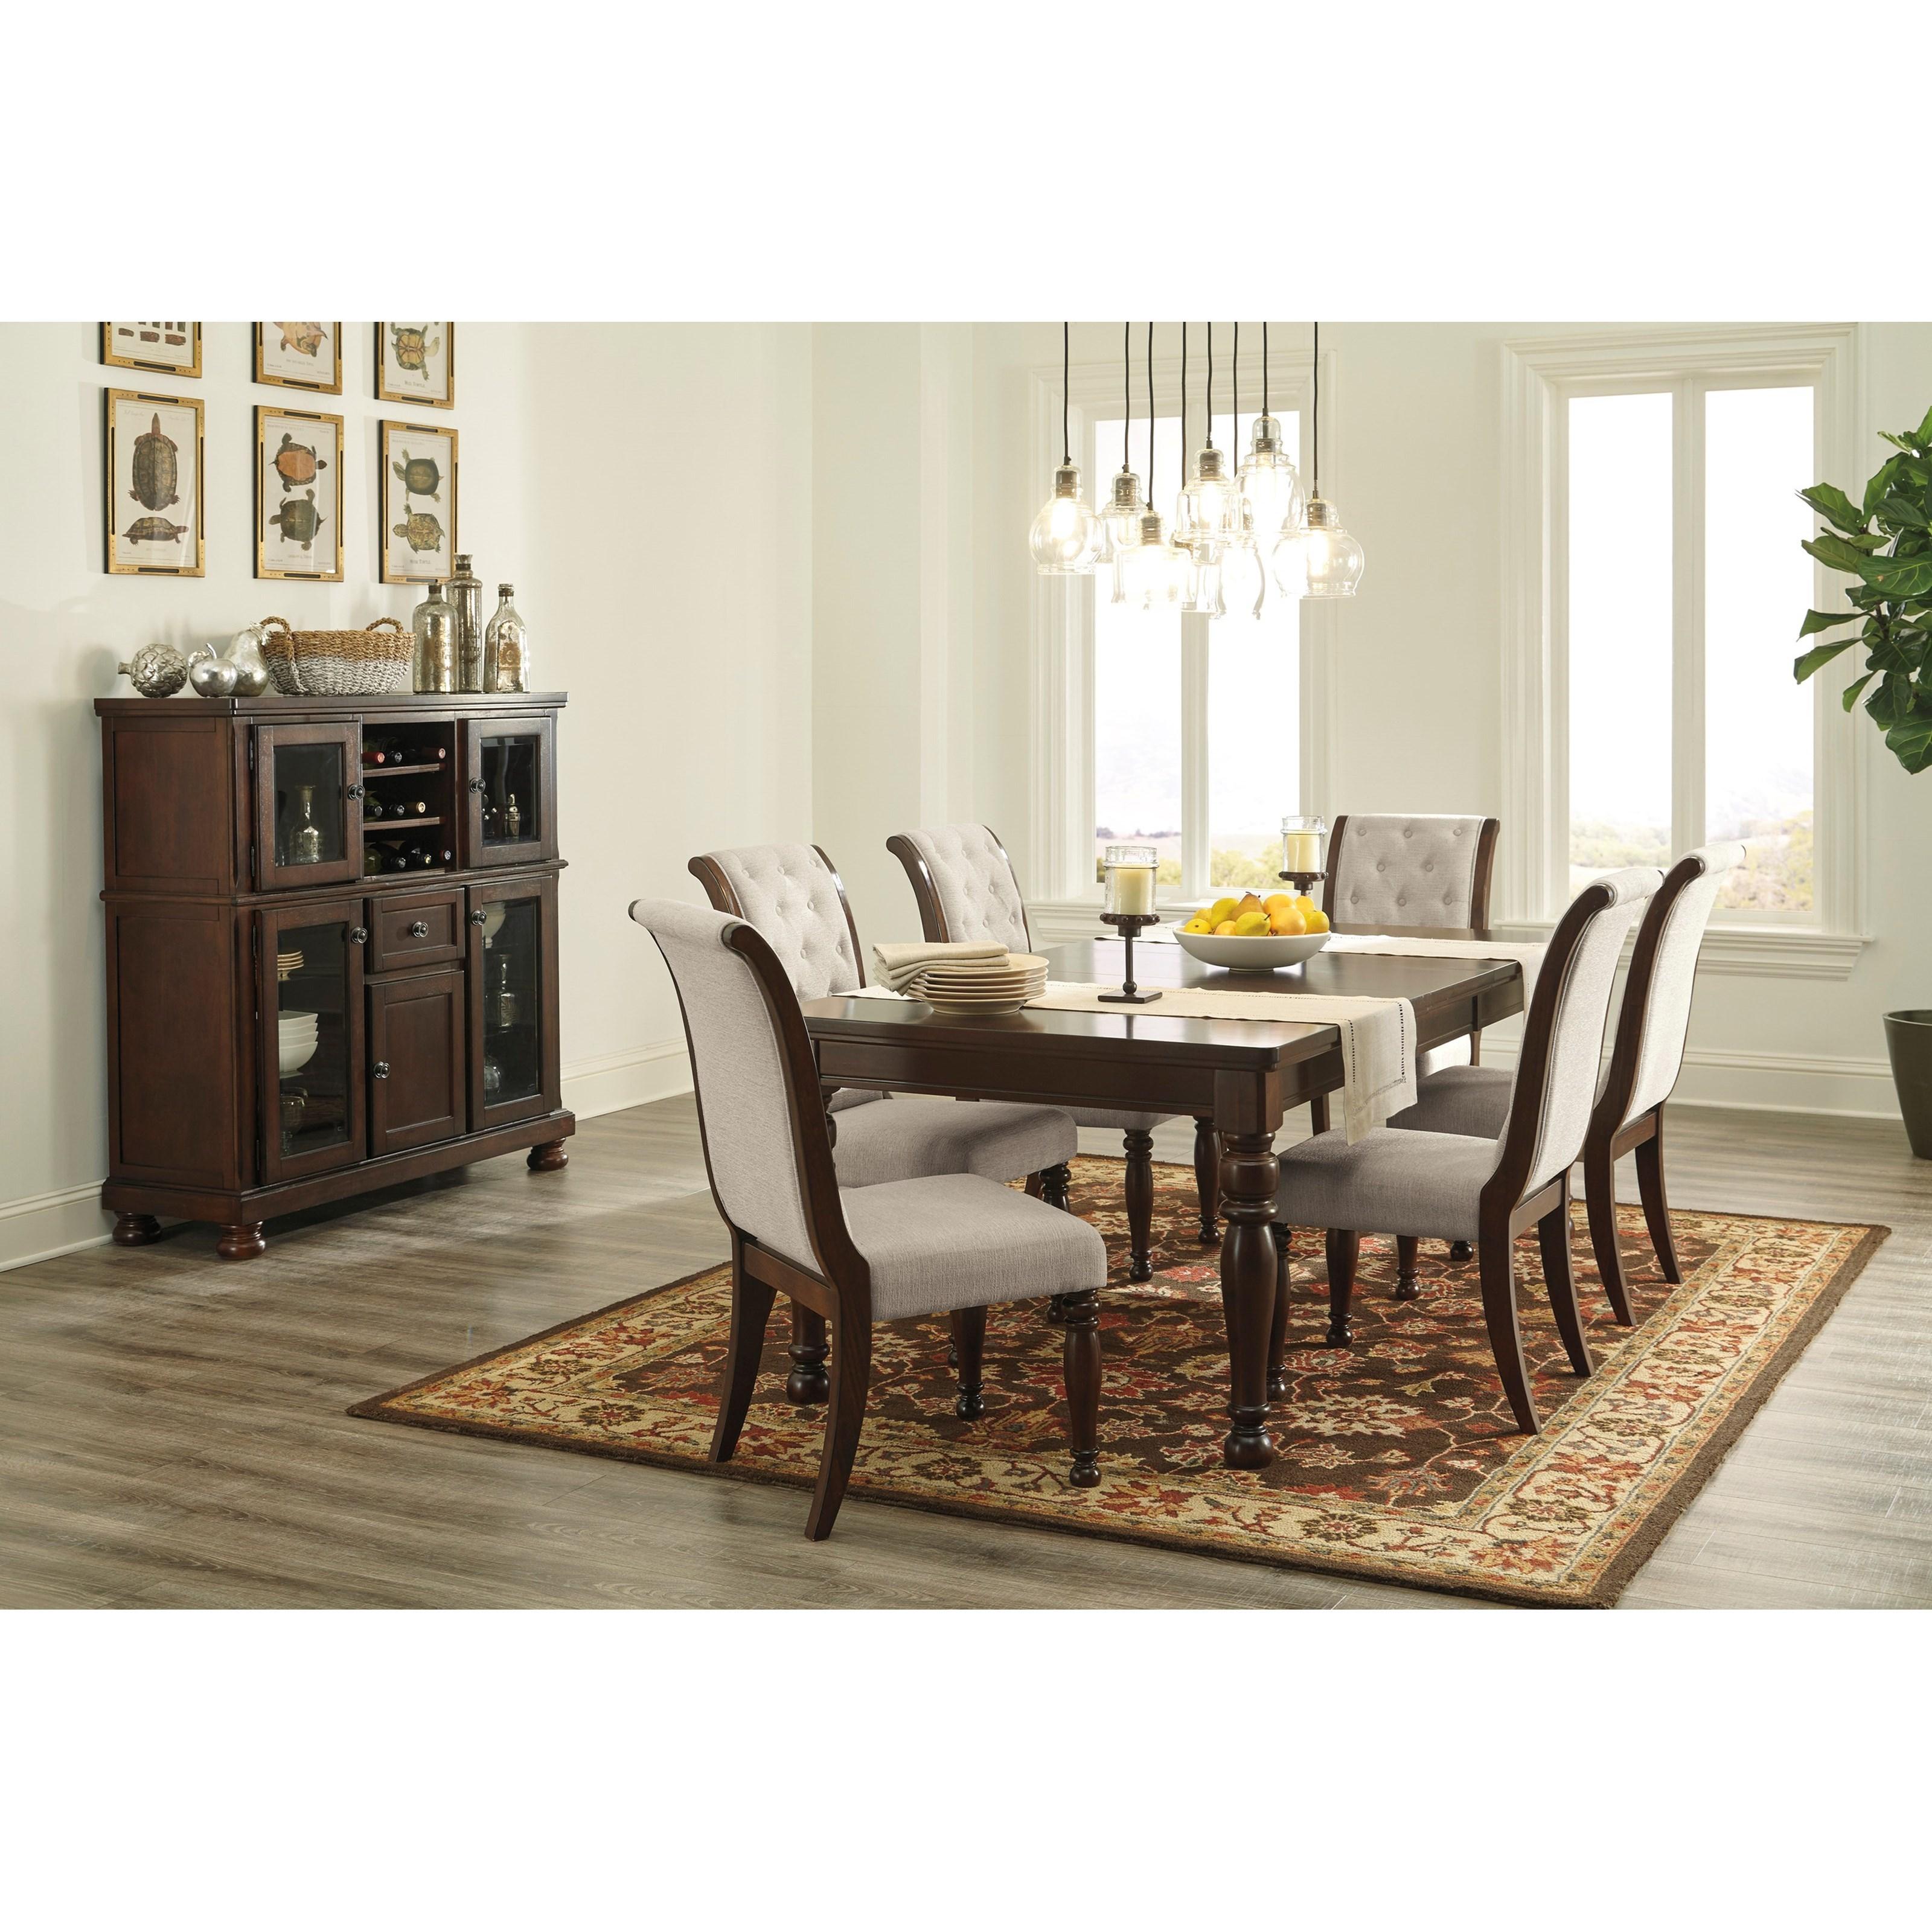 Ashley Furniture Porter Formal Dining Room Group Turk Rh Turkfurniture Com Hutch